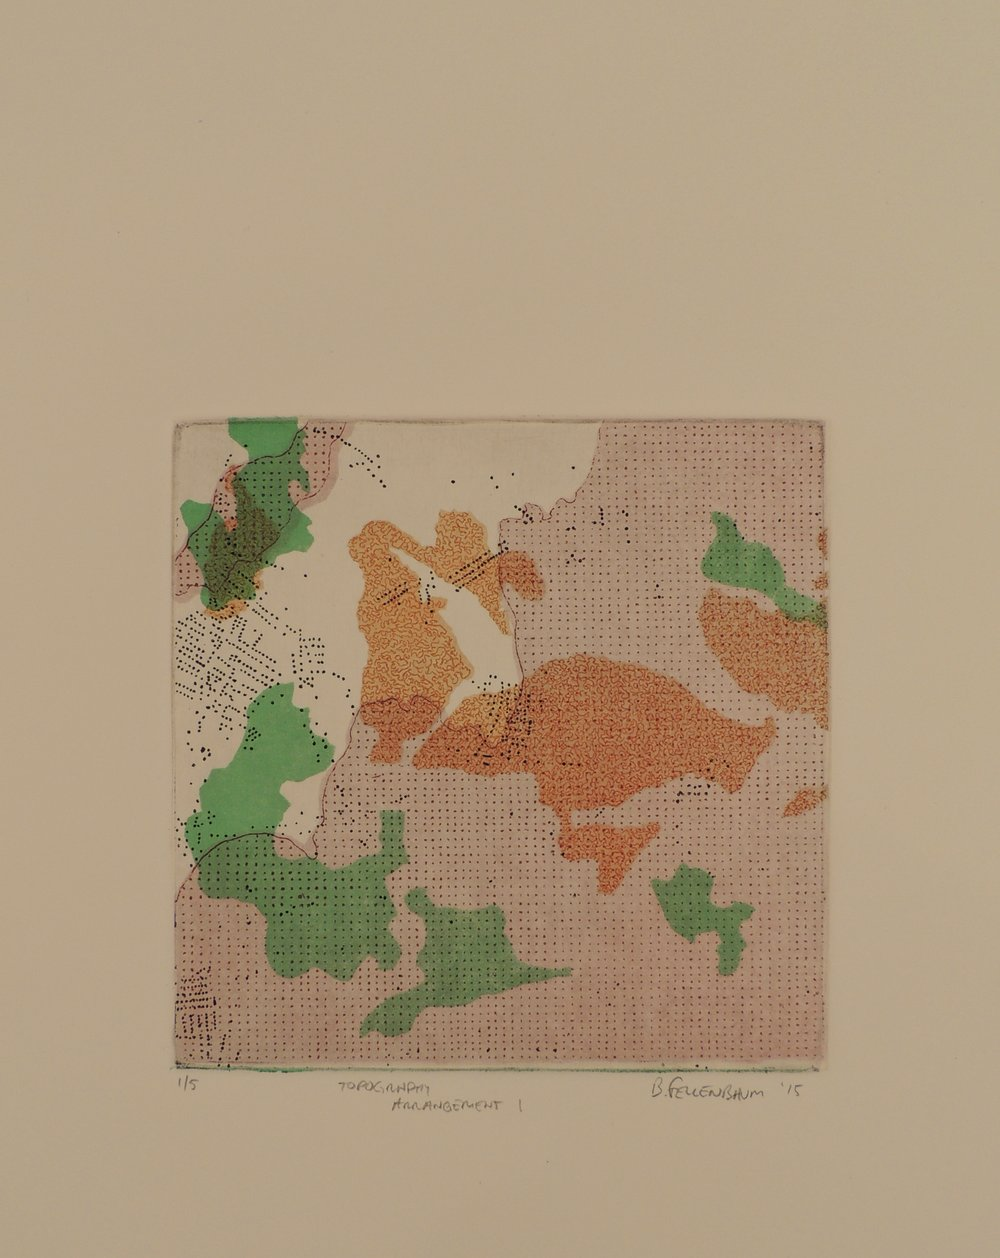 Topography Arrangement I